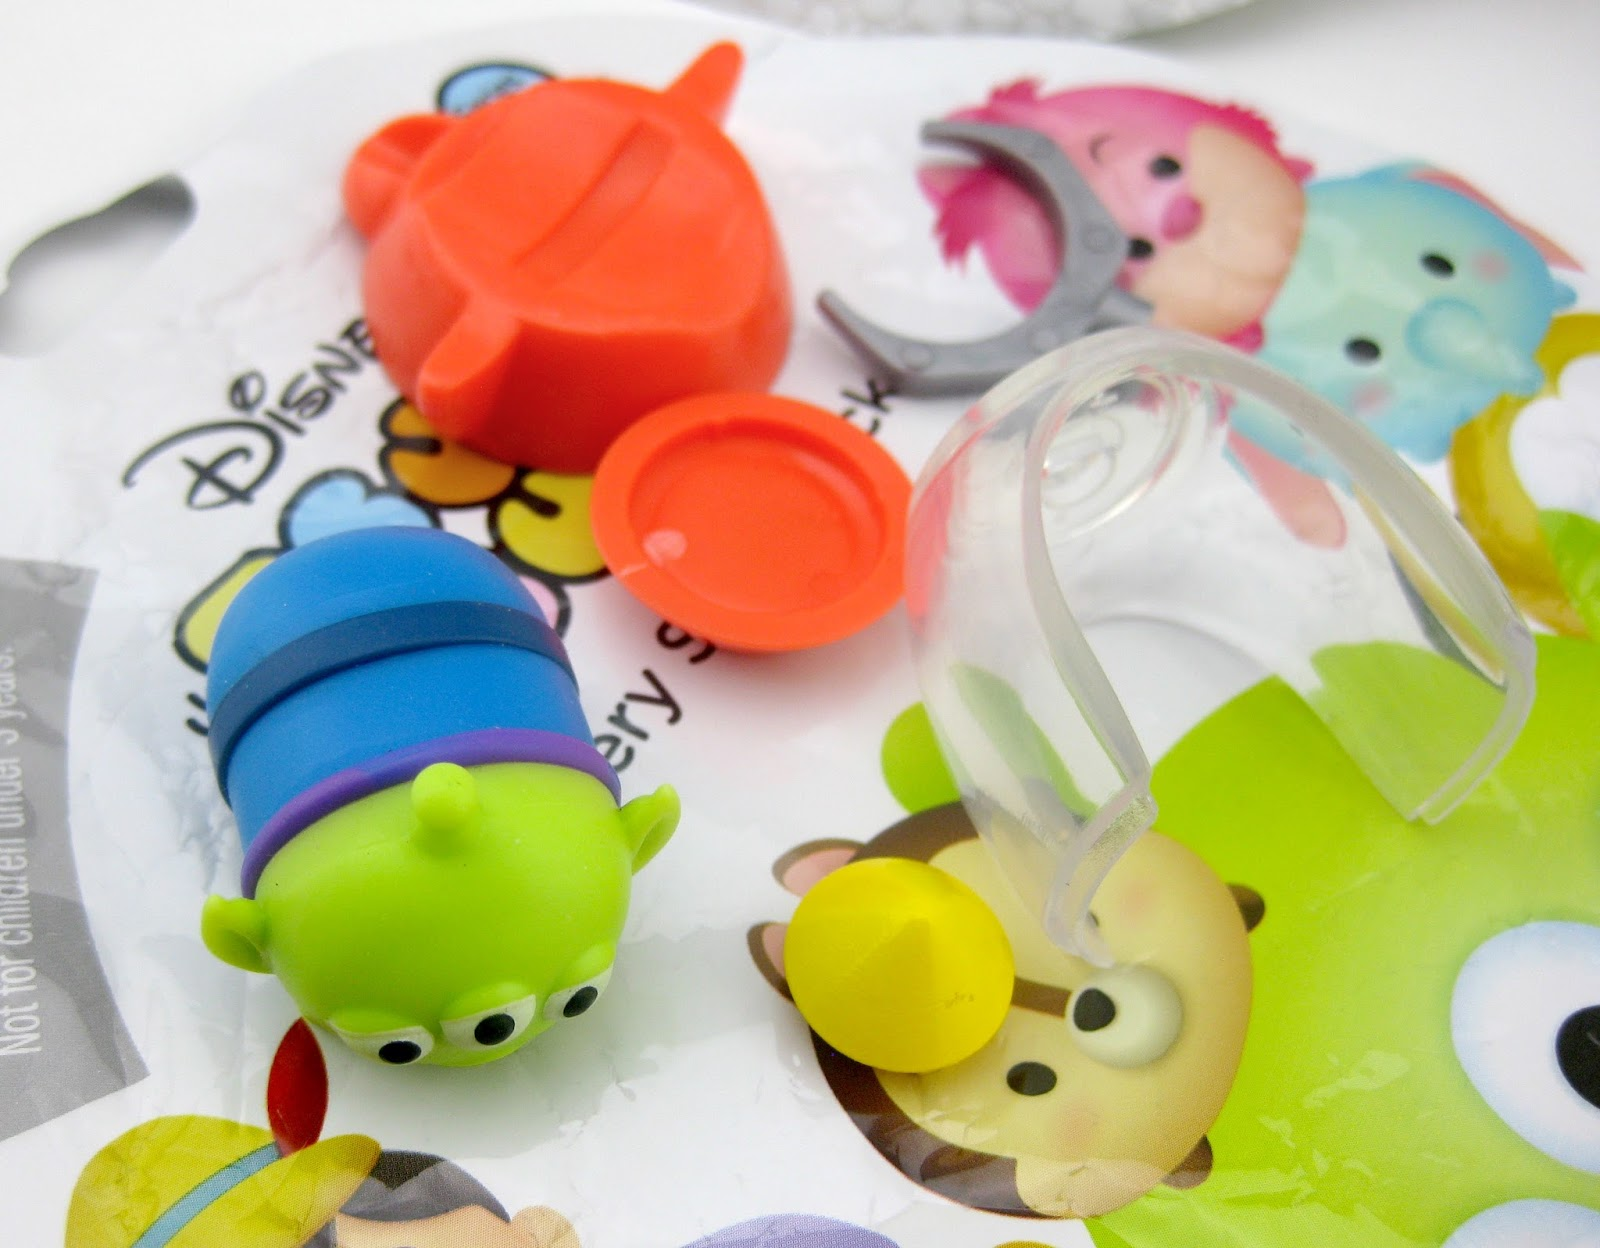 Disney Tsum Tsum Mystery Stack Packs by Jakks Pacific (Series 2) alien